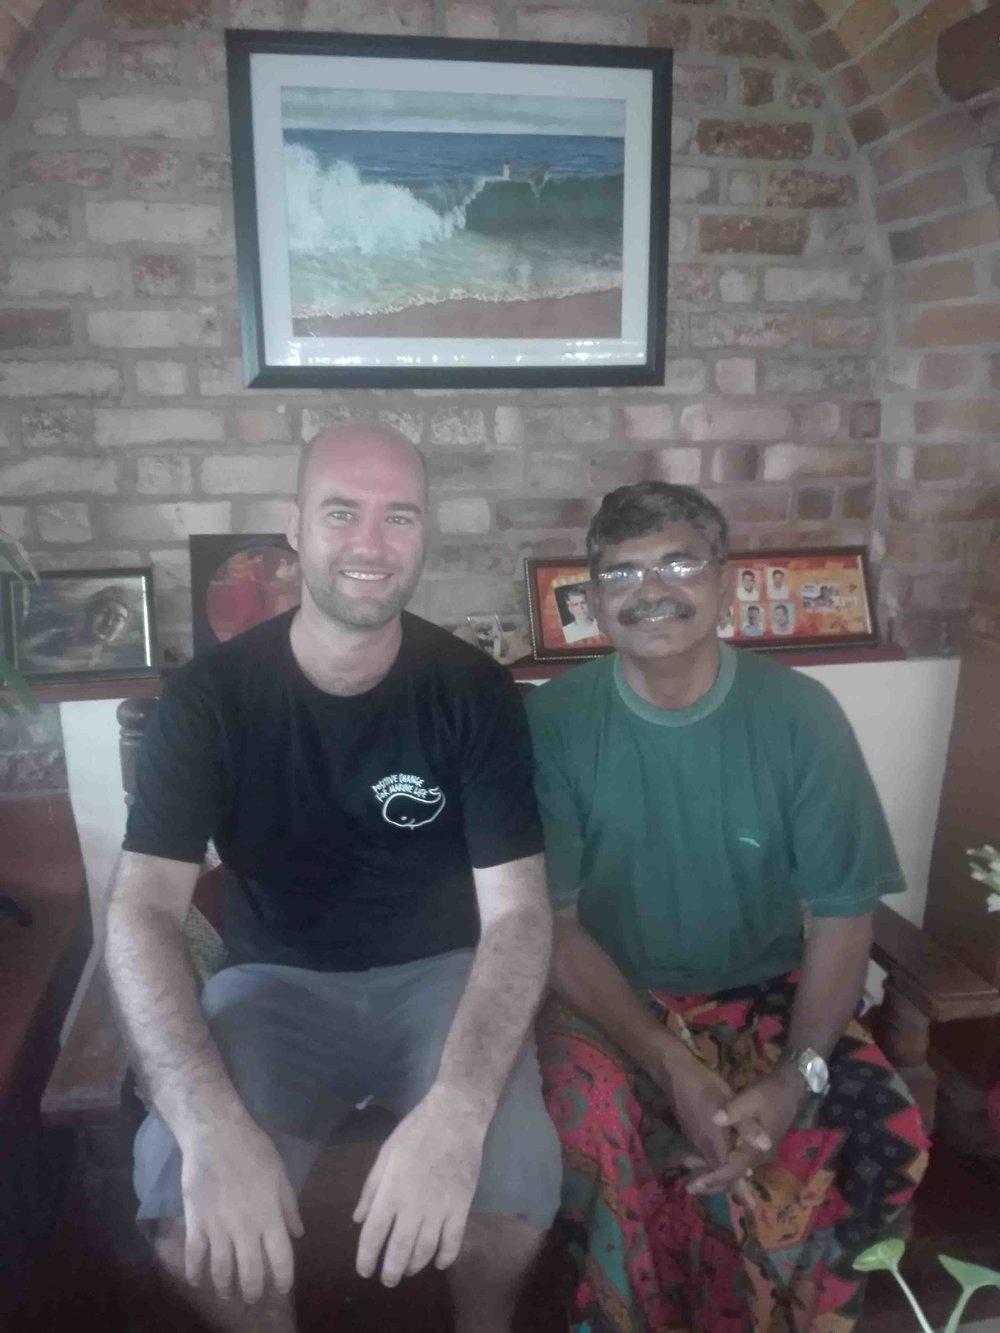 Blake meeting with the head of Clean Kerala.